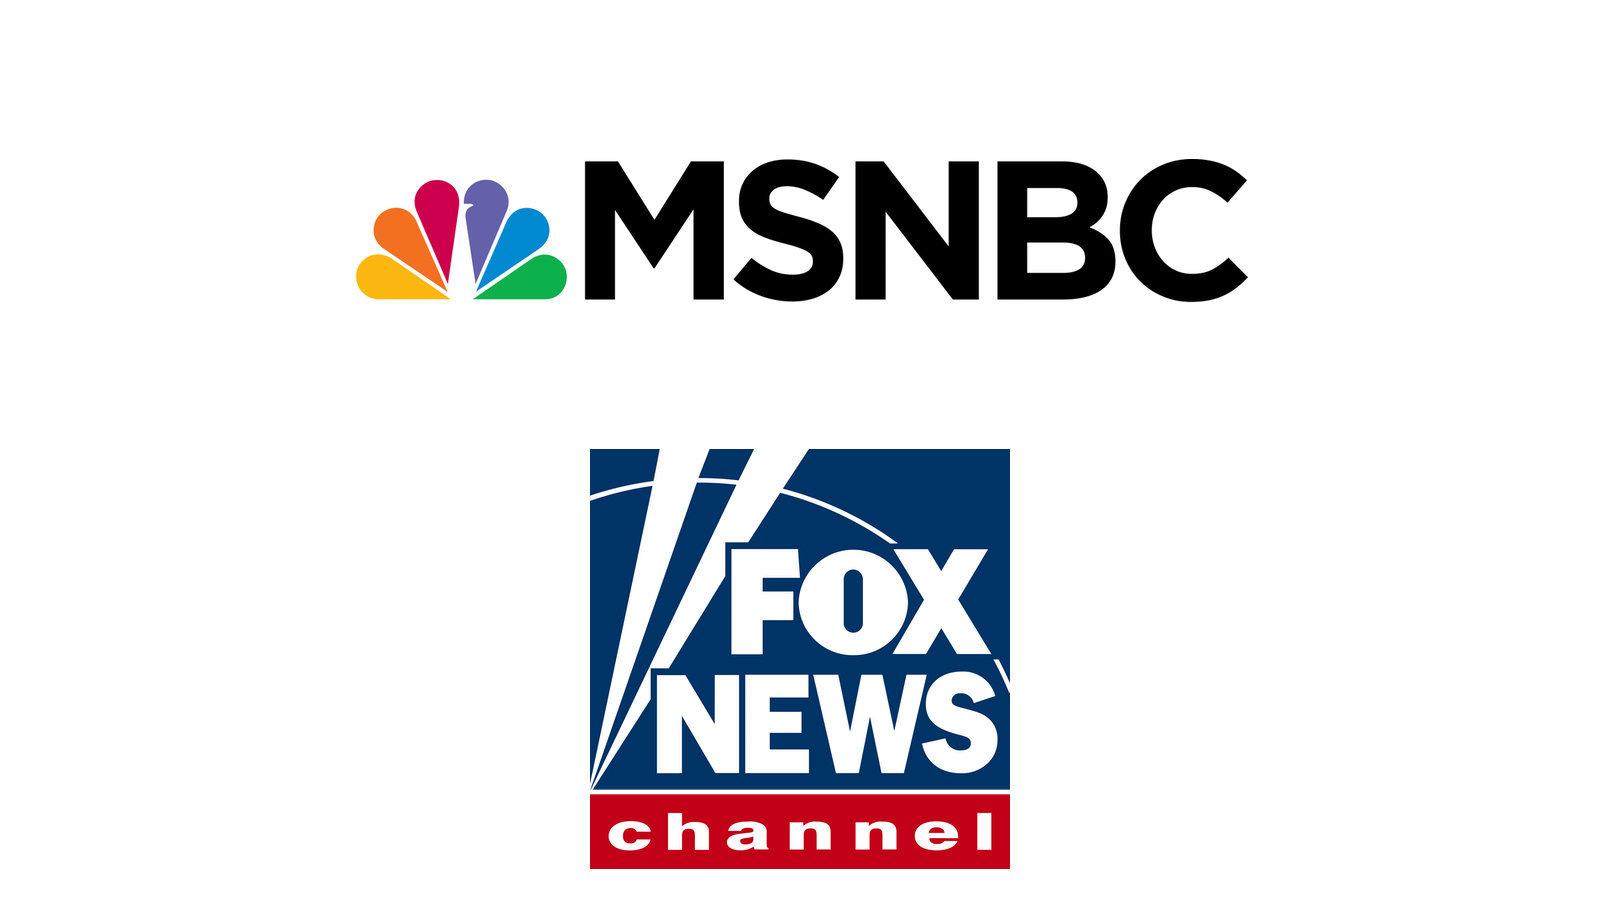 MSNBC Fox News